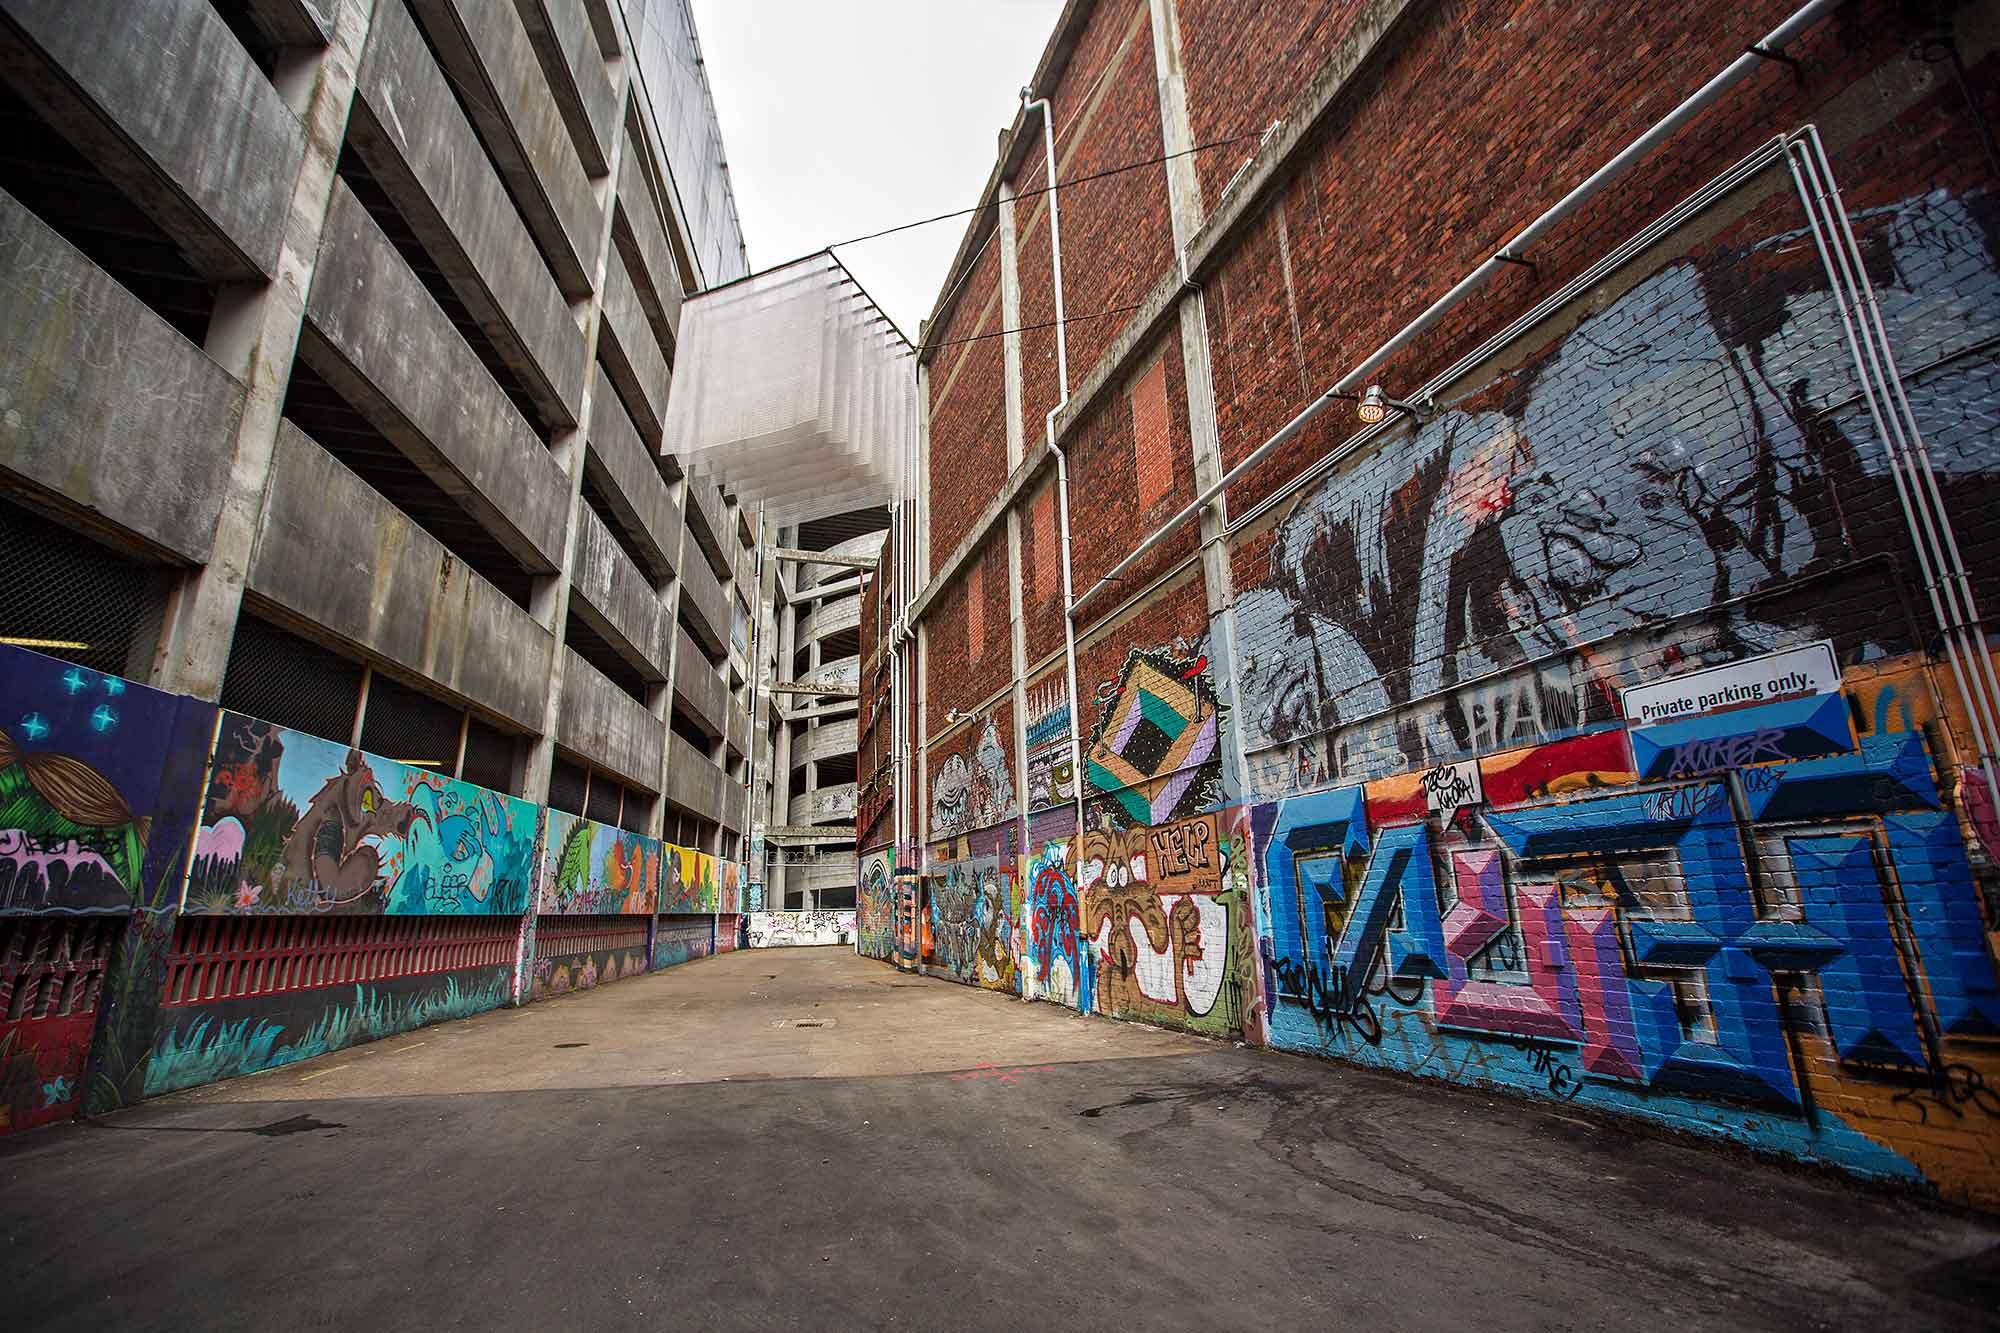 Street art in Wellington, New Zealand. © Ulli Maier & Nisa Maier